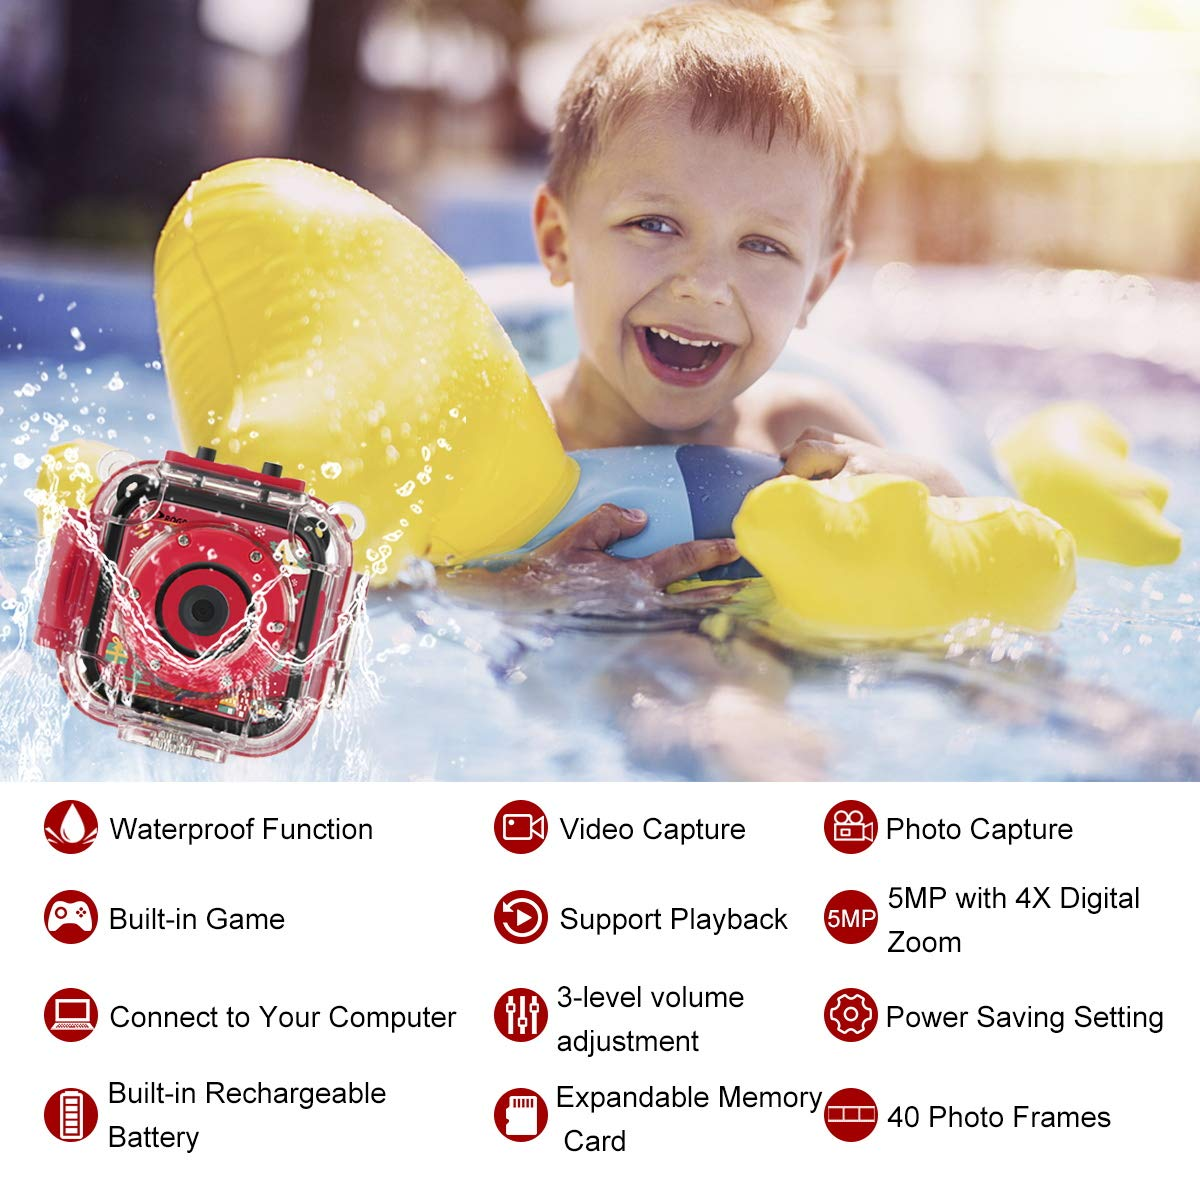 Prograce Kids Camera Underwater Waterproof Camera Camcorder for Boys Girls 4X Digital Zoom 3-Level Volume Adjustment(Red) by Prograce (Image #5)